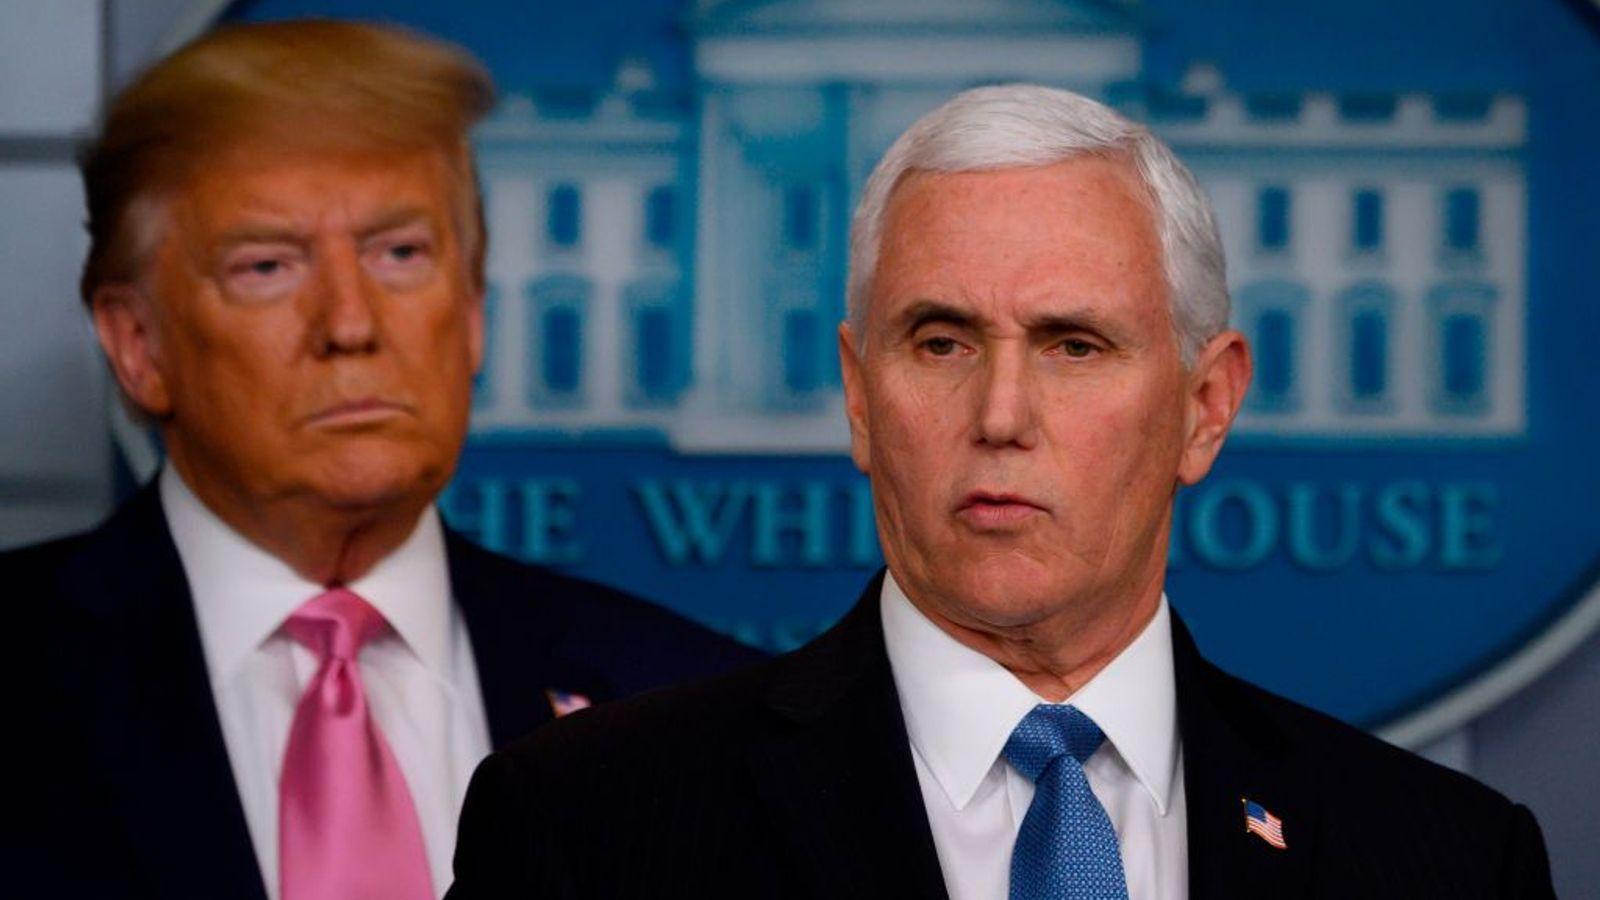 'Mike has a certain talent for this': Trump picks Pence to run coronavirus response